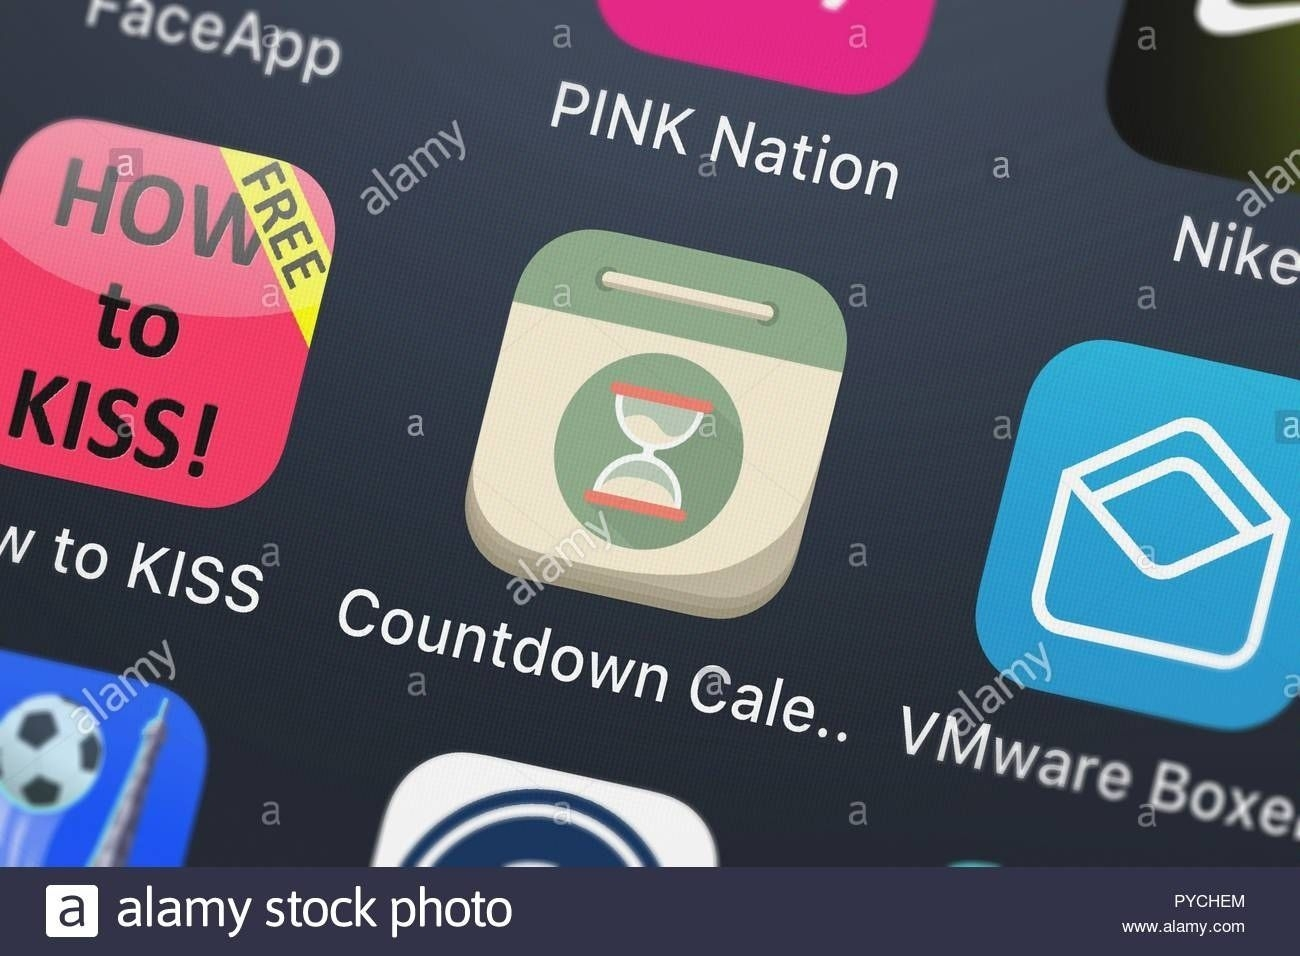 birthday calendar countdown app in 2020 | birthday calendar